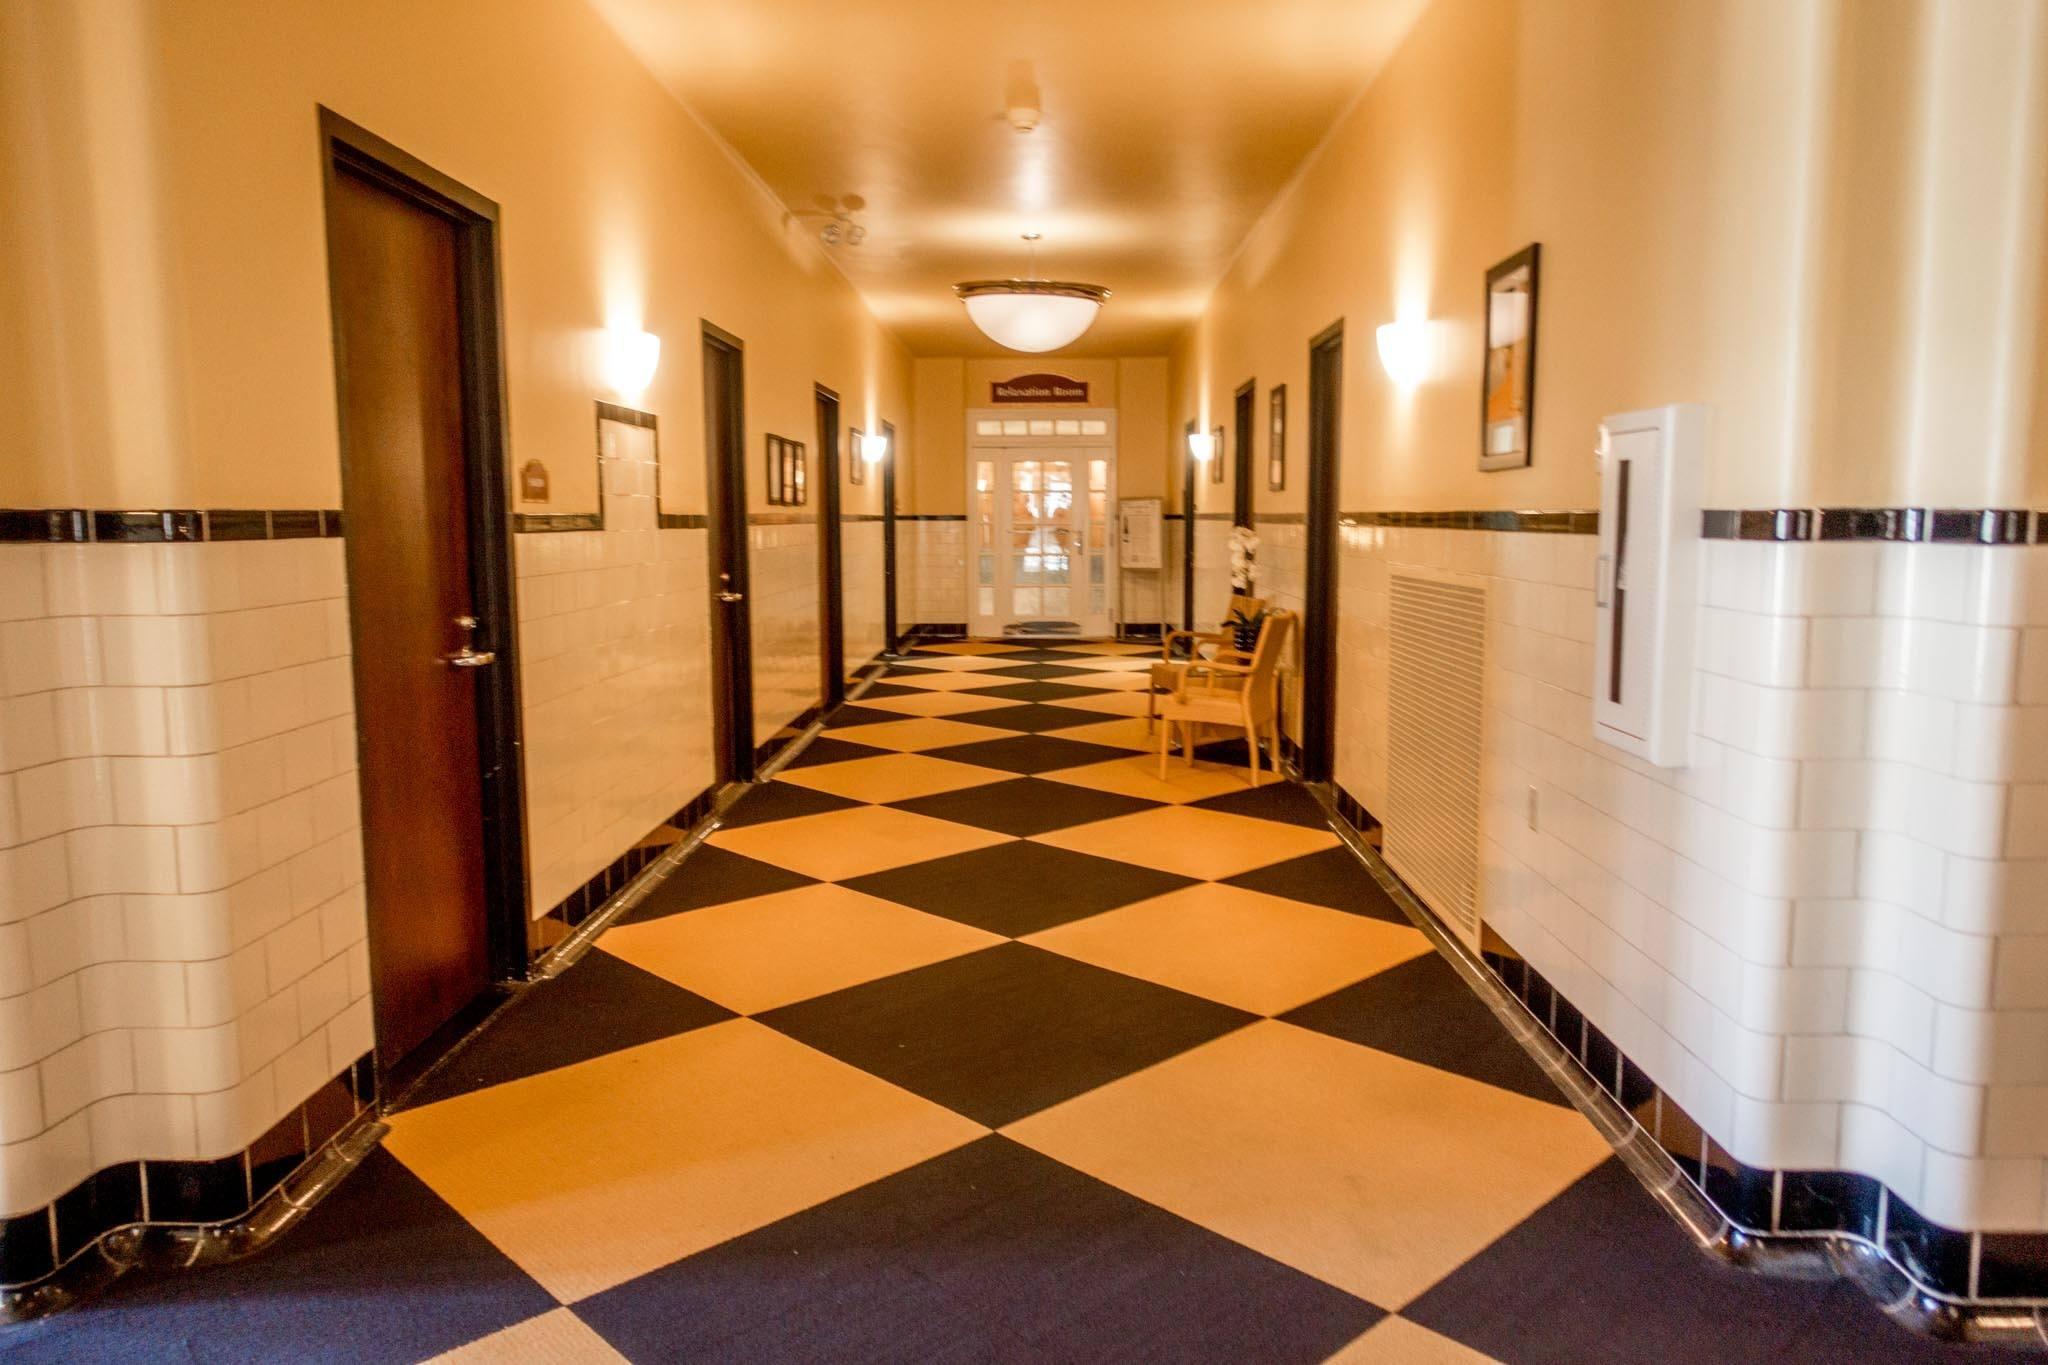 Black and white tiled hallway